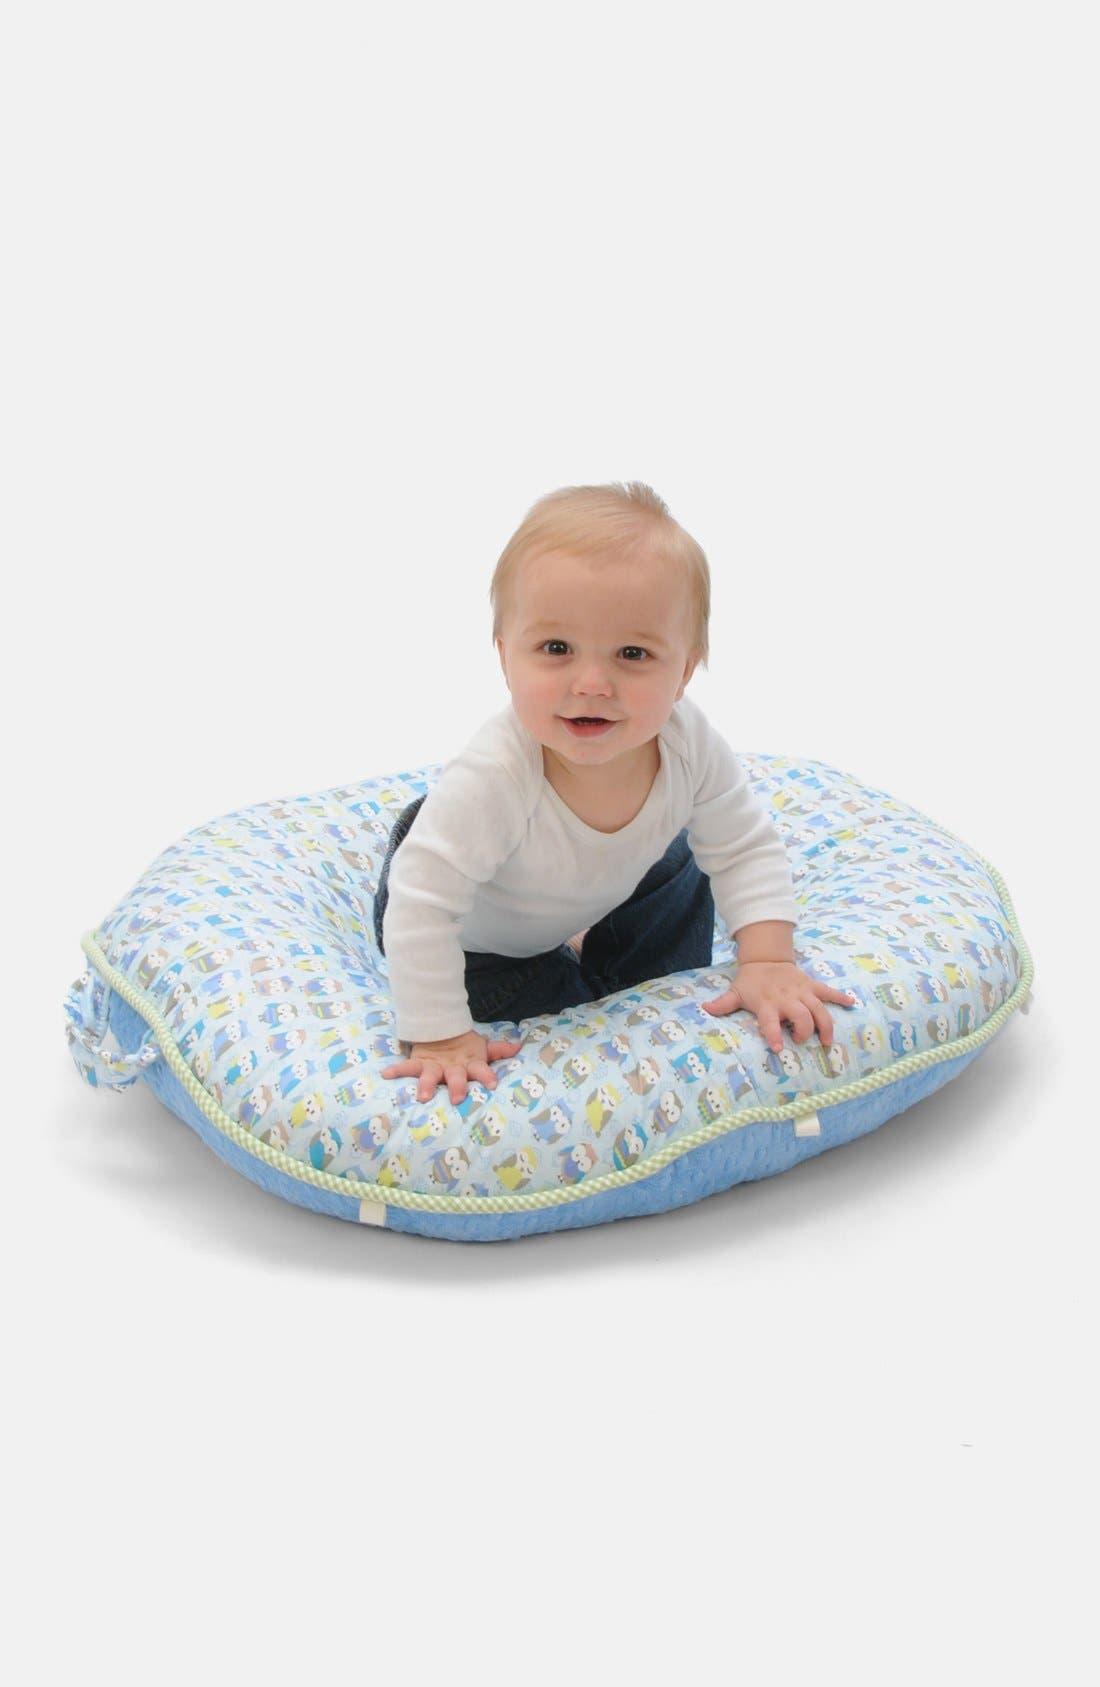 Alternate Image 1 Selected - Pello 'Pello - Hoo Loves Ya Boy' Portable Floor Pillow (Baby)